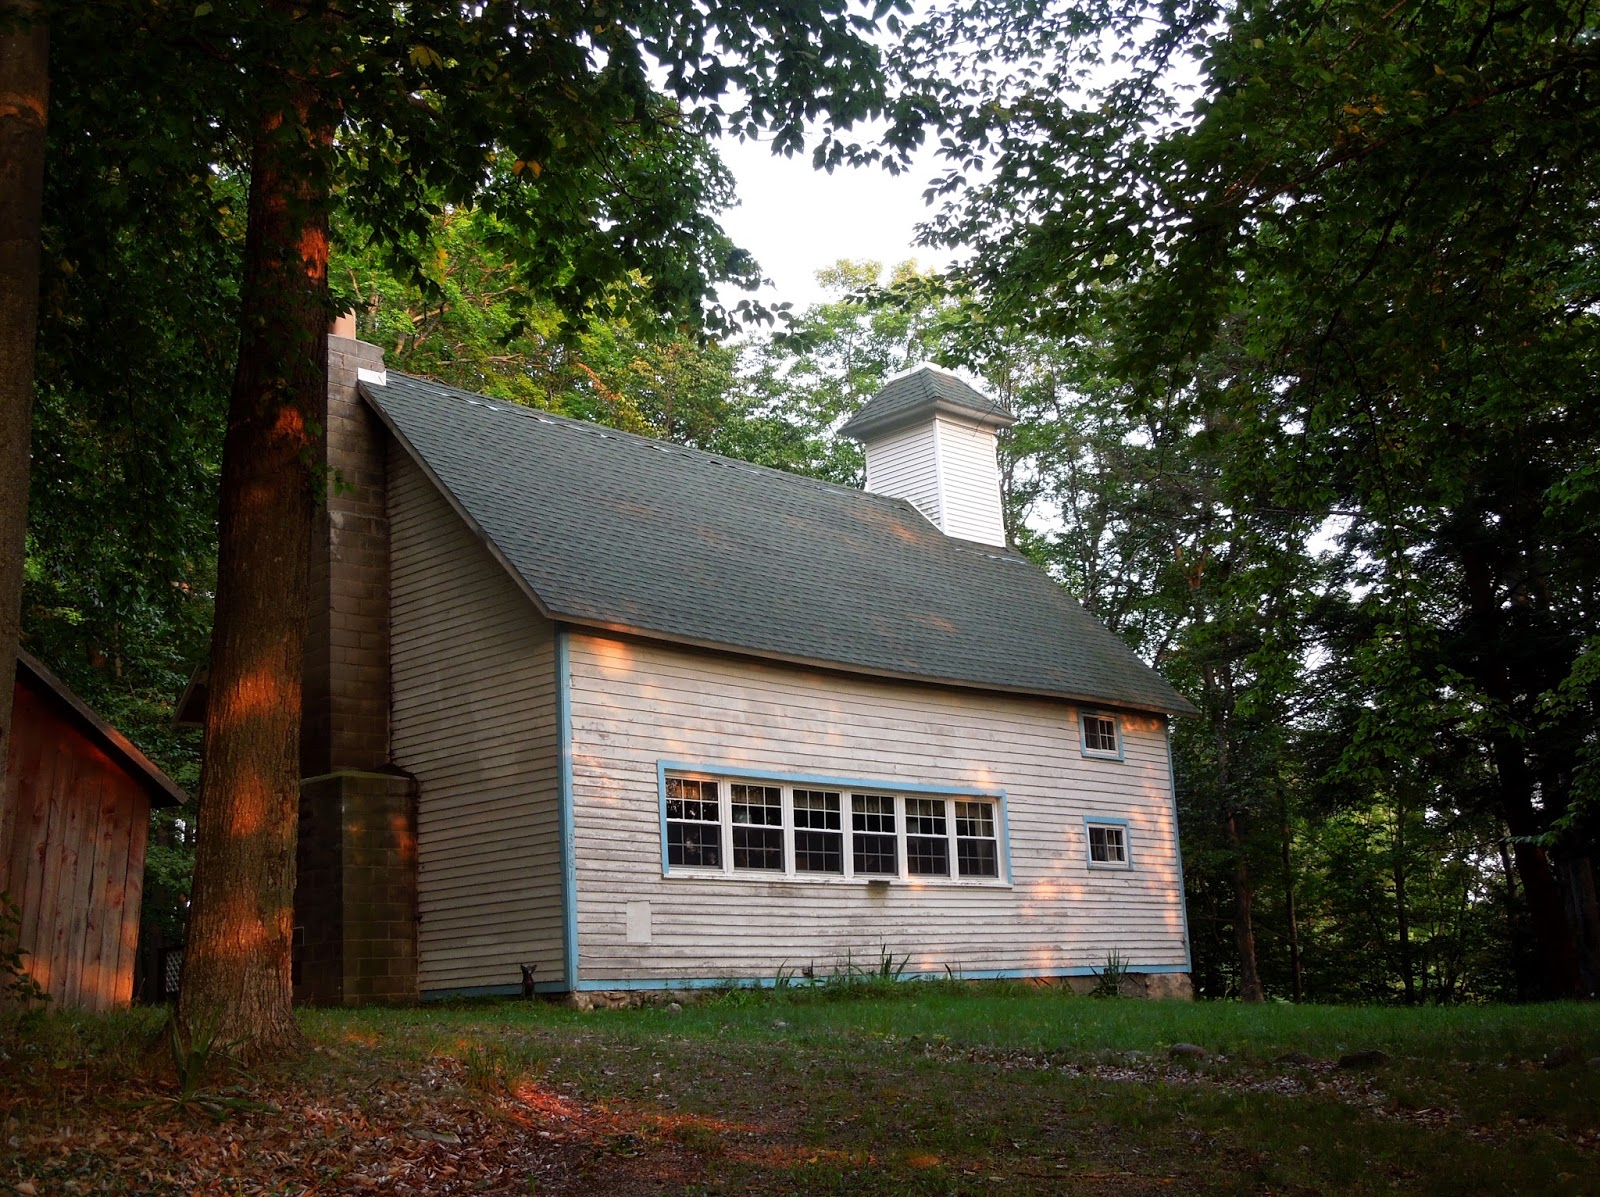 Michigan emmet county alanson - Location 3981 Resort Rd Alanson In Littlefield Township